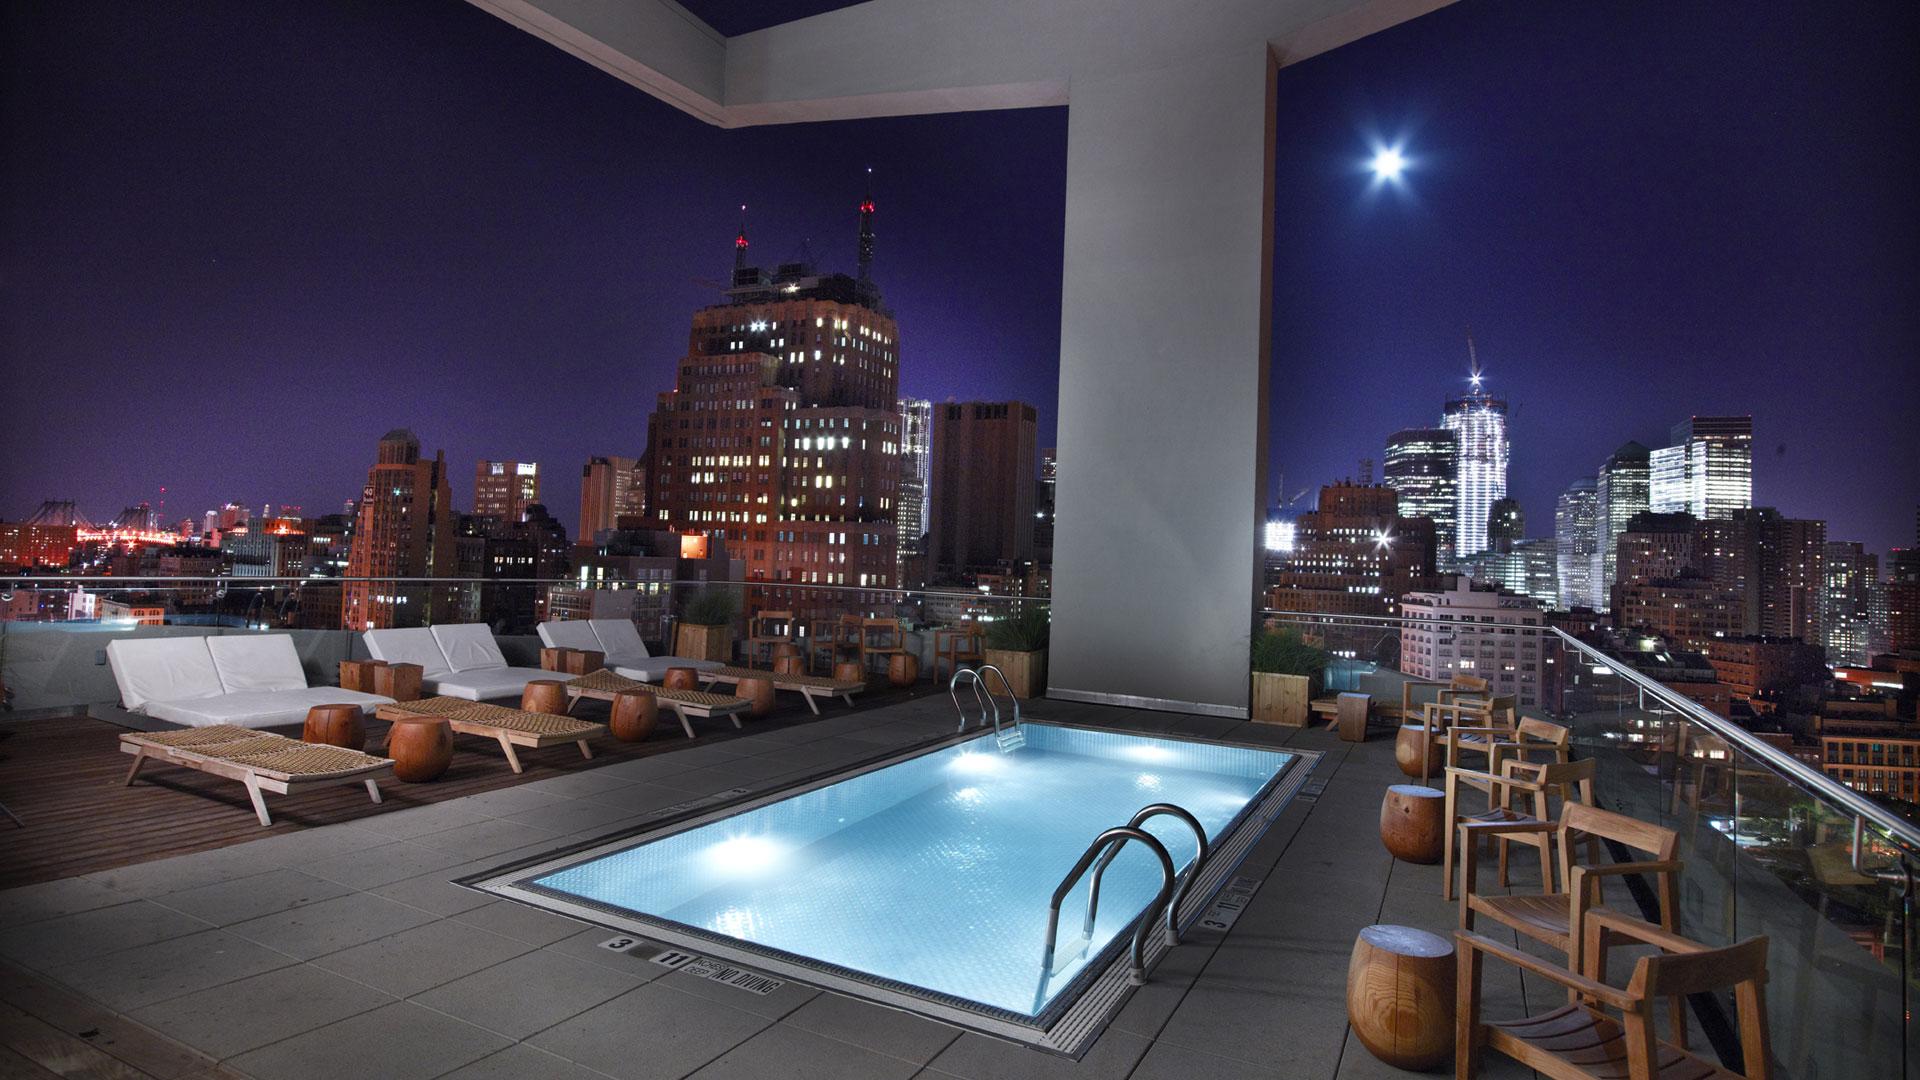 Rooftop Hot Tub Nyc | Sevenstonesinc.com